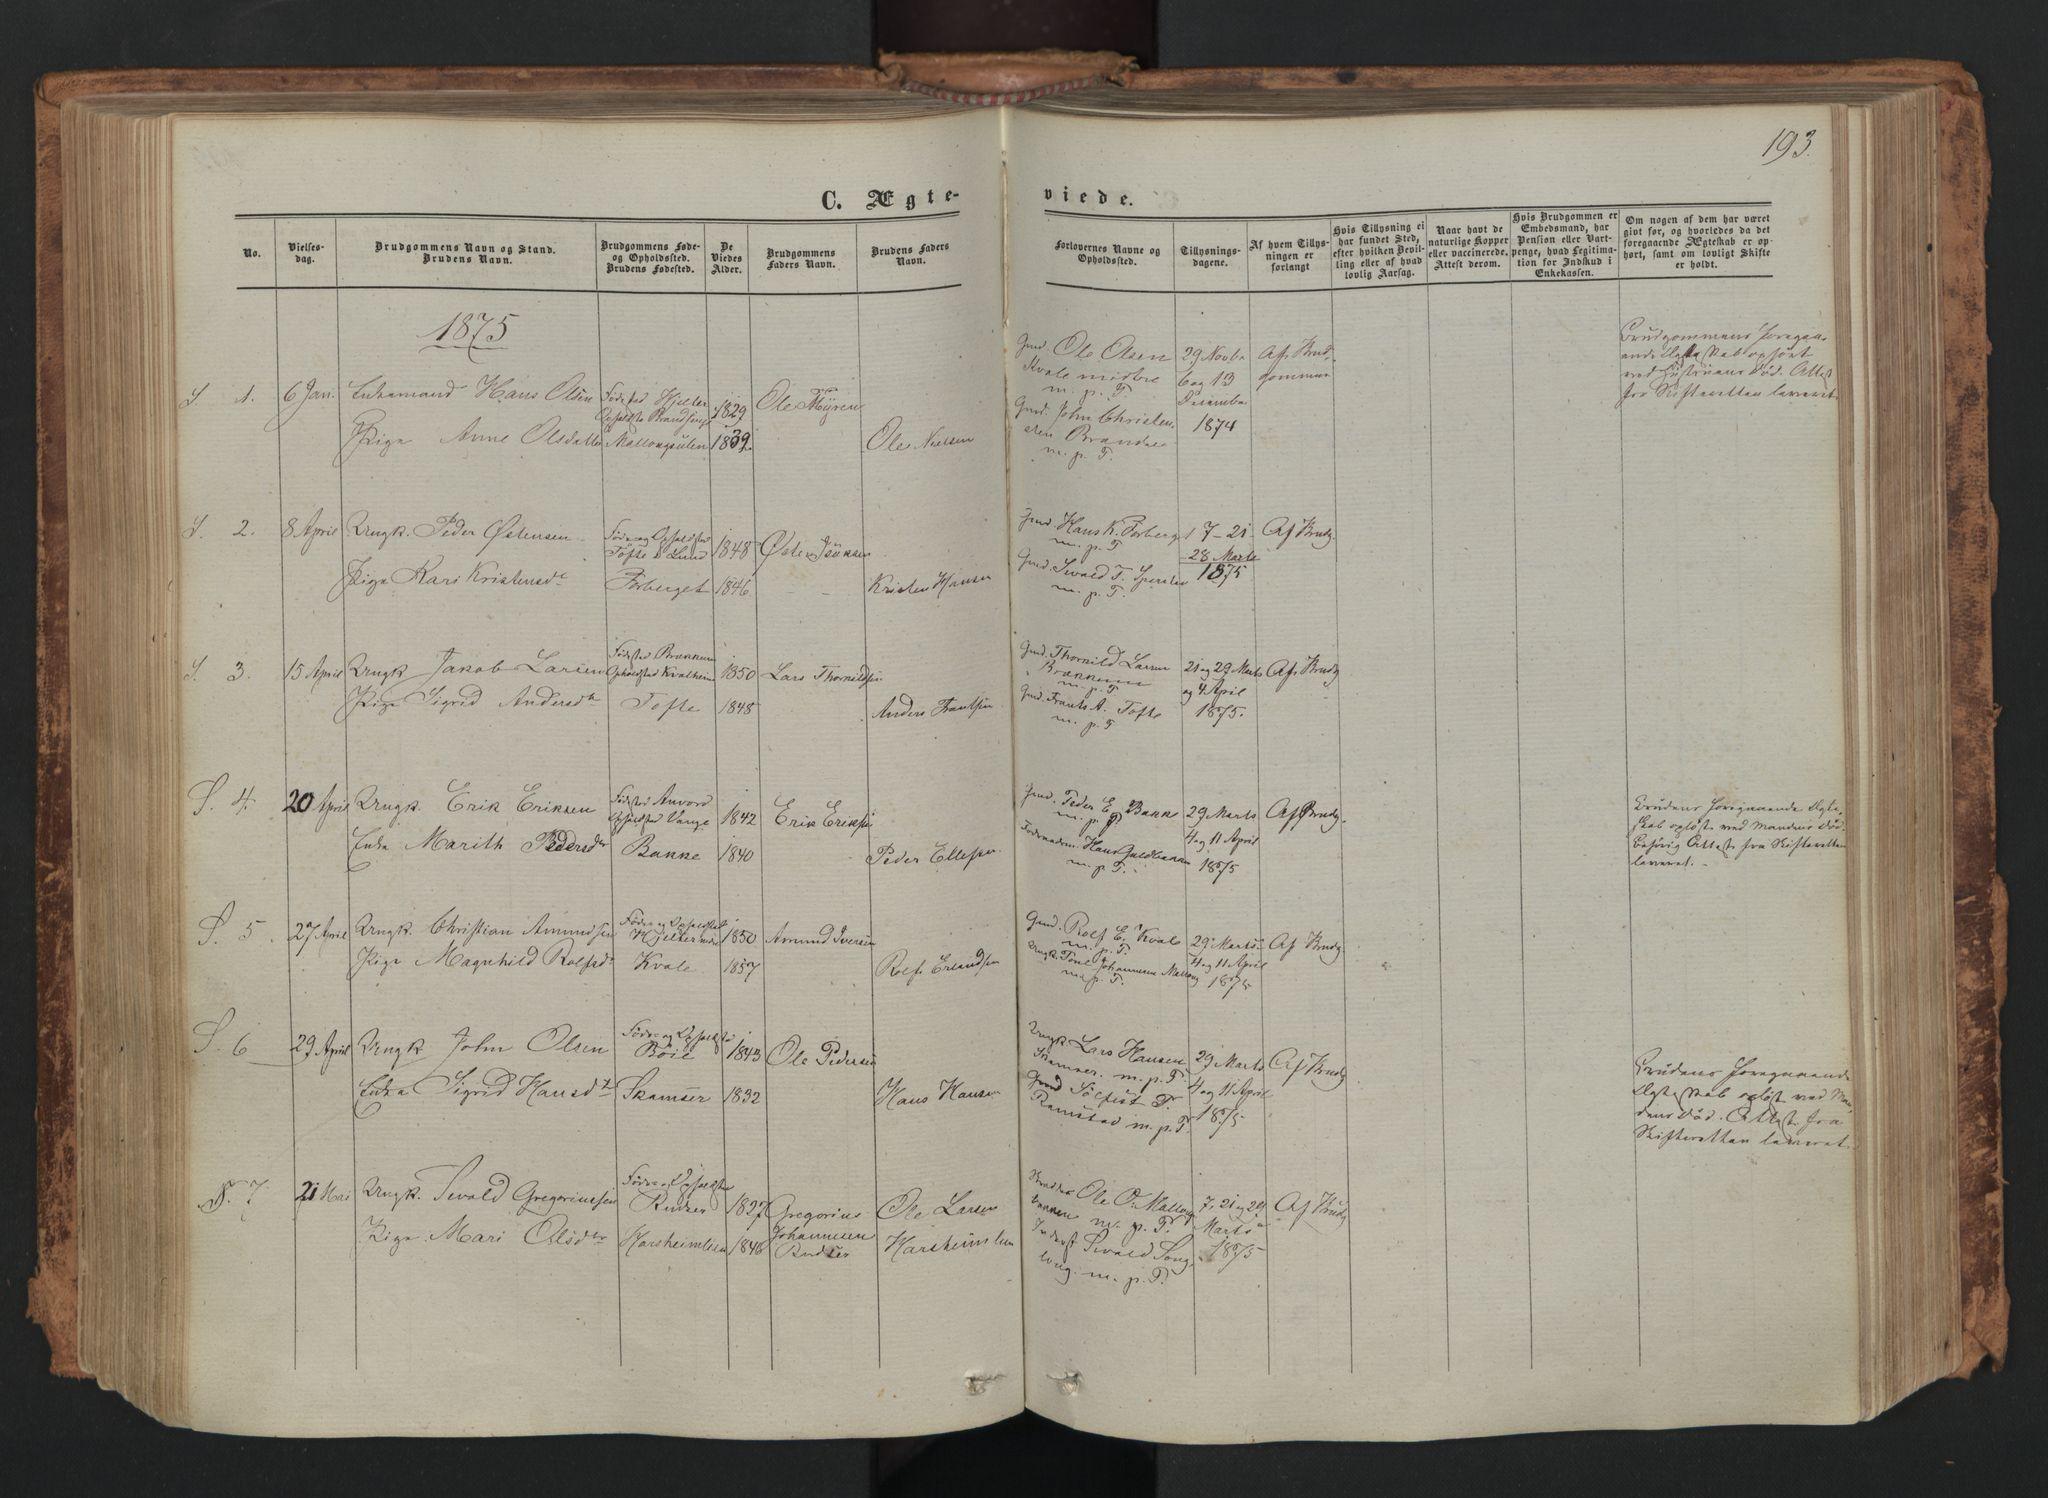 SAH, Skjåk prestekontor, Ministerialbok nr. 1, 1863-1879, s. 193